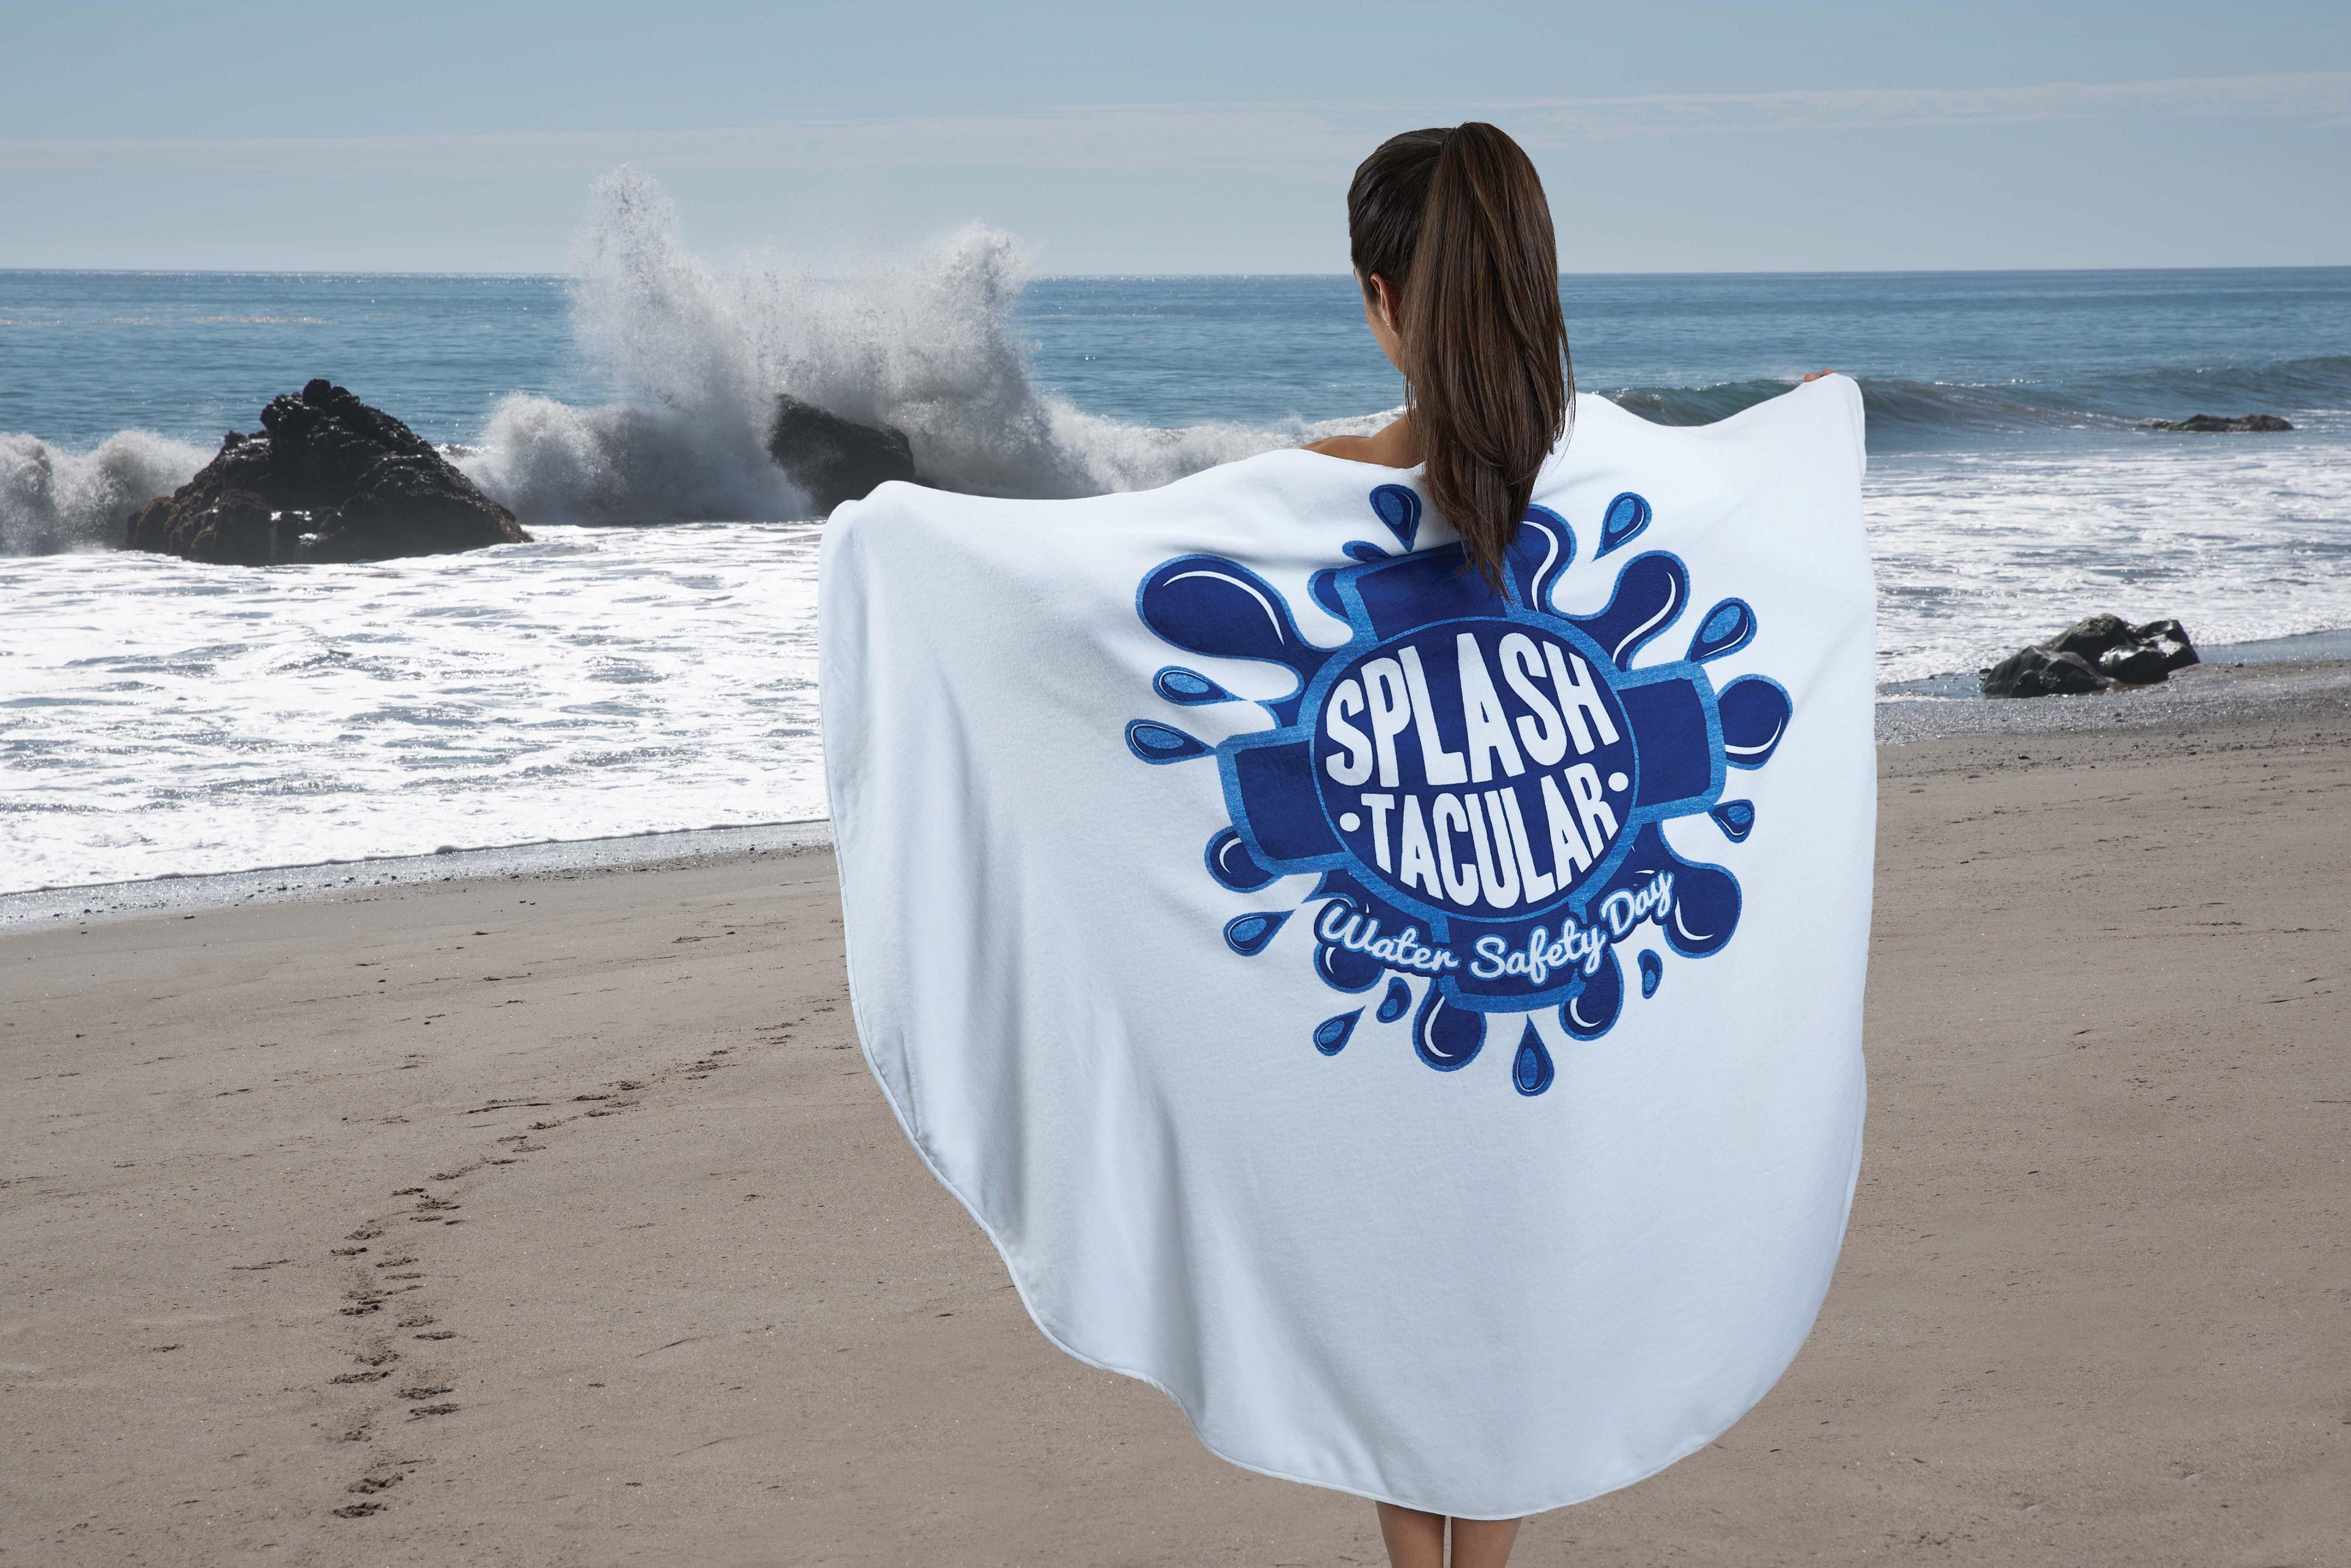 Verronica's vagina print beach towel by nipplesofvenus